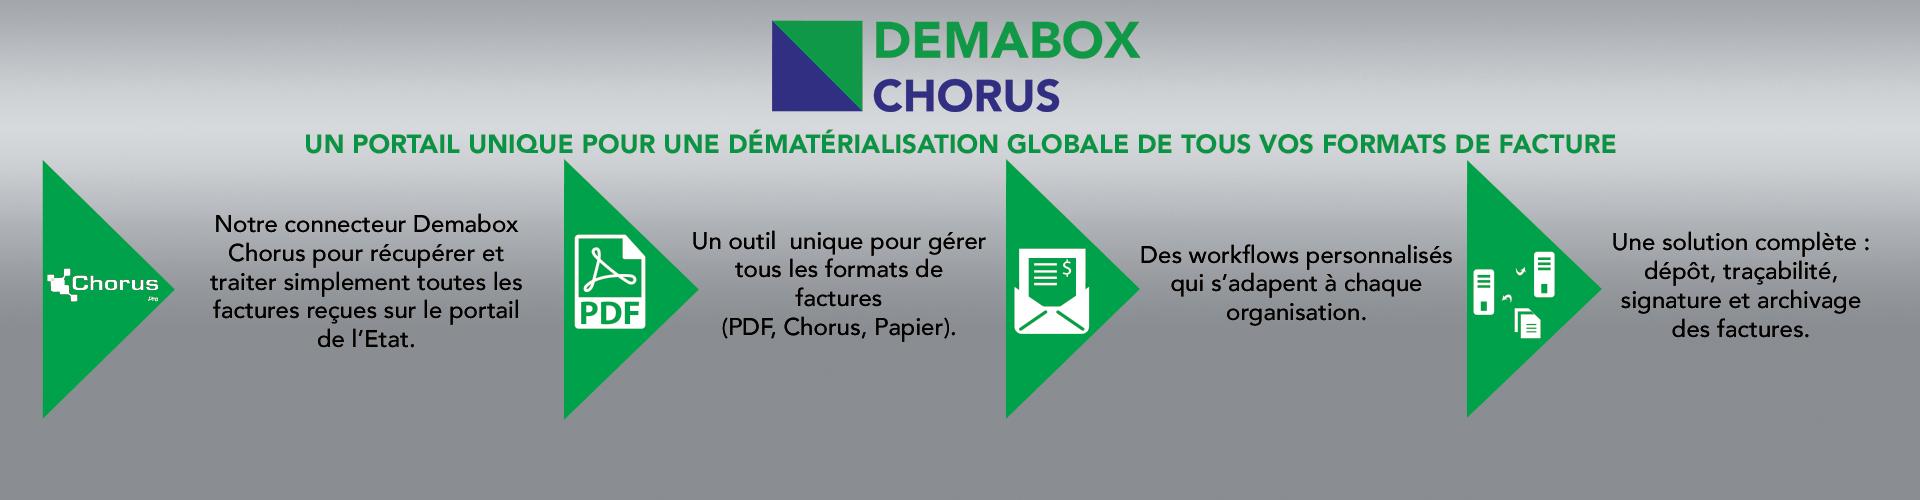 Bannière-accueil-site_Demabox-Chorus